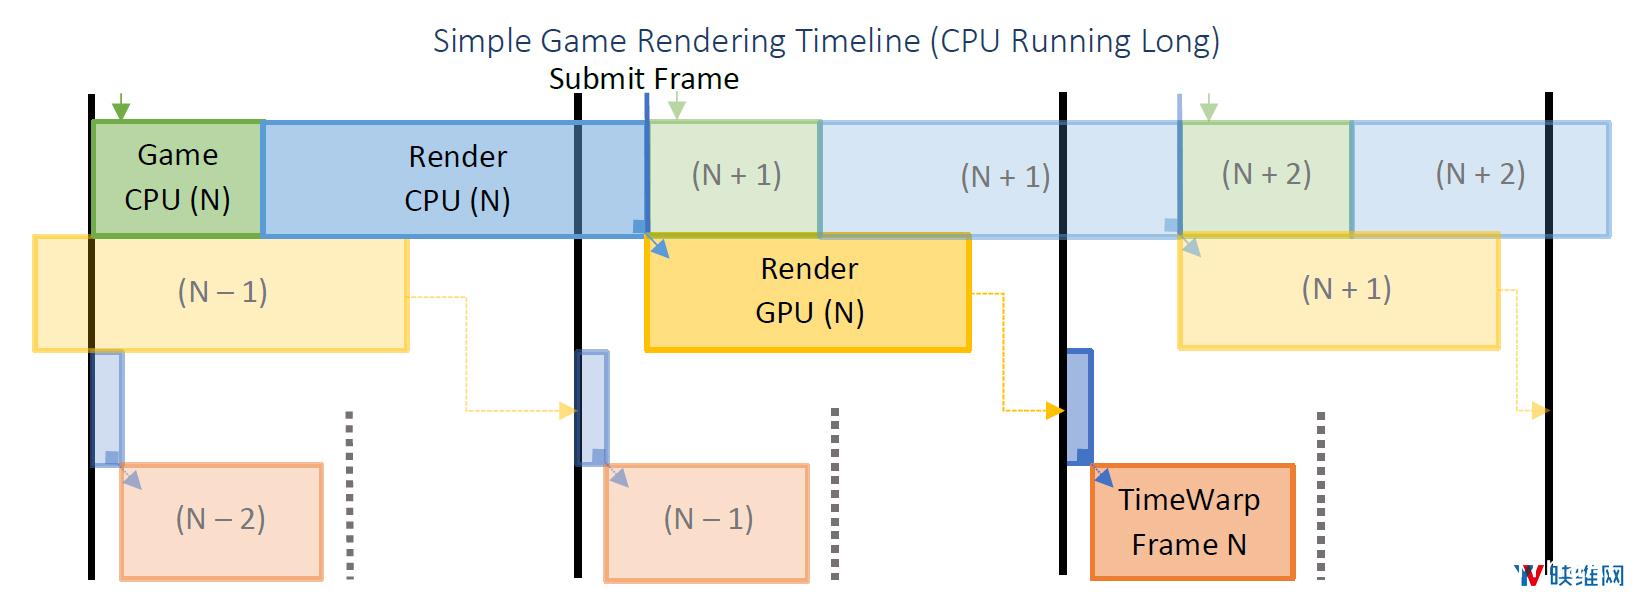 Oculus详述『延迟』问题及对应『帧渲染』解决方案 资源教程 第7张